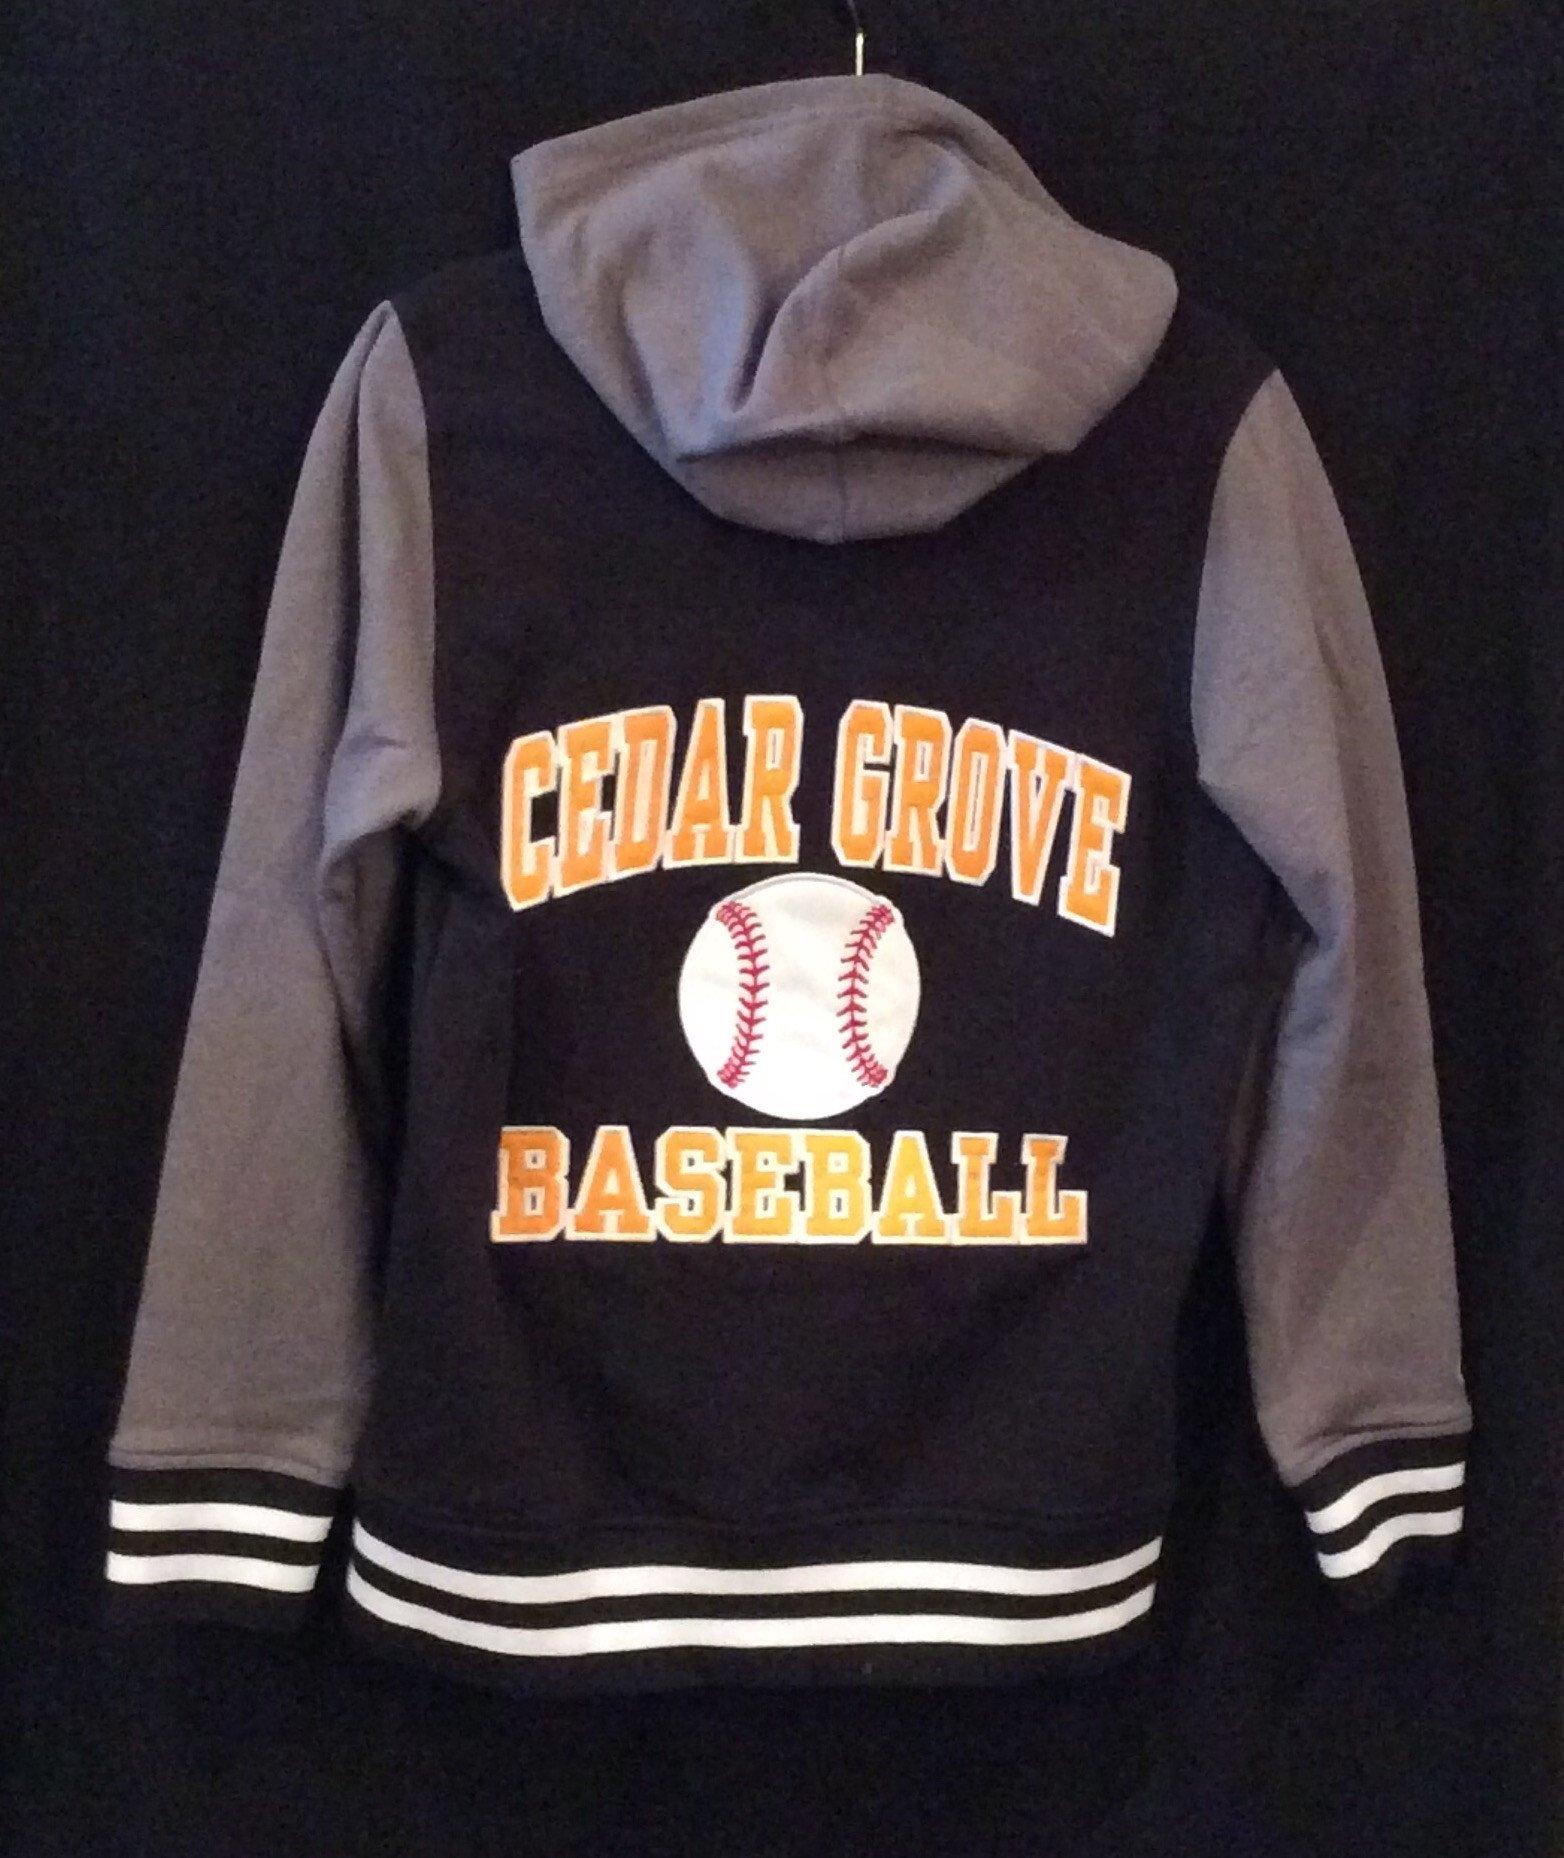 Holloway Cedar Grove Baseball Accomplish Jacket (With Name)